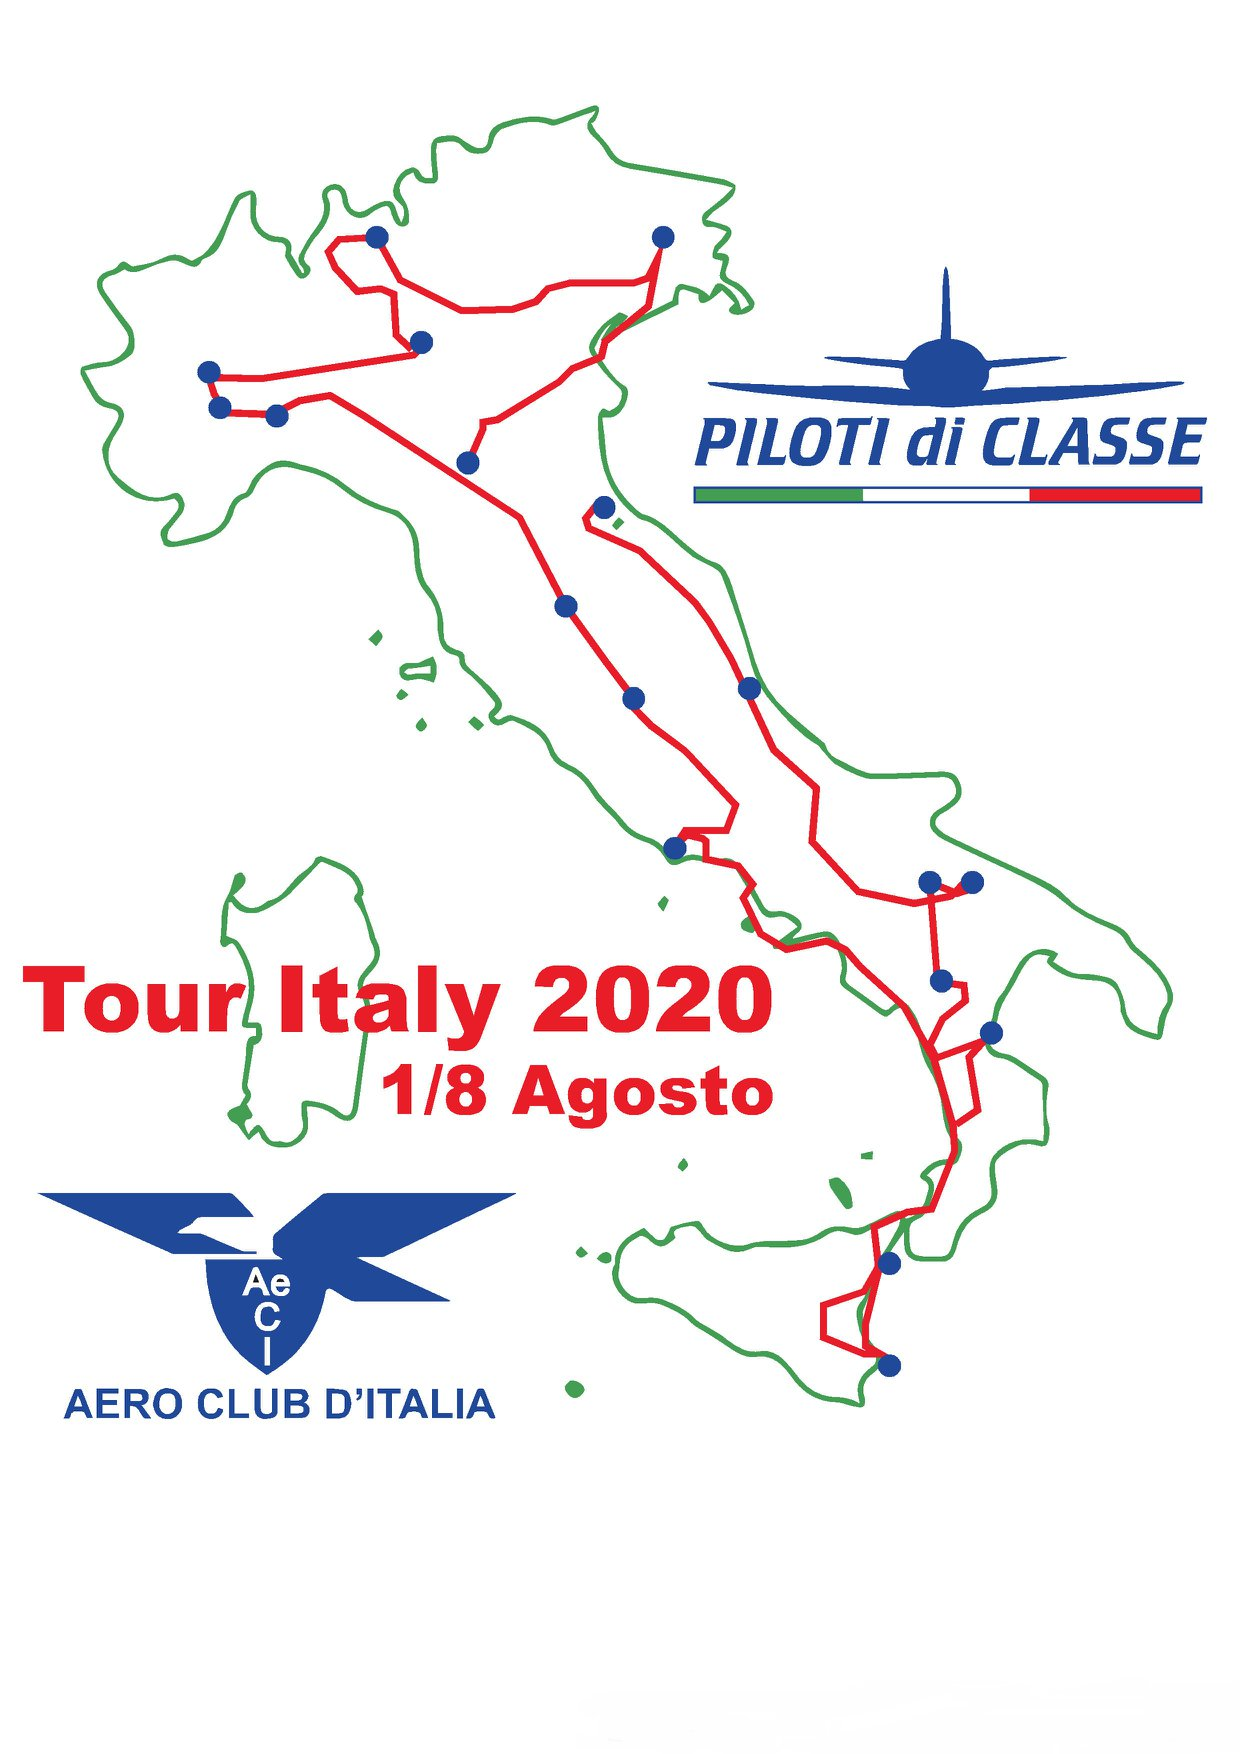 giro d' italia aereo- piloti di classe-flyeurope